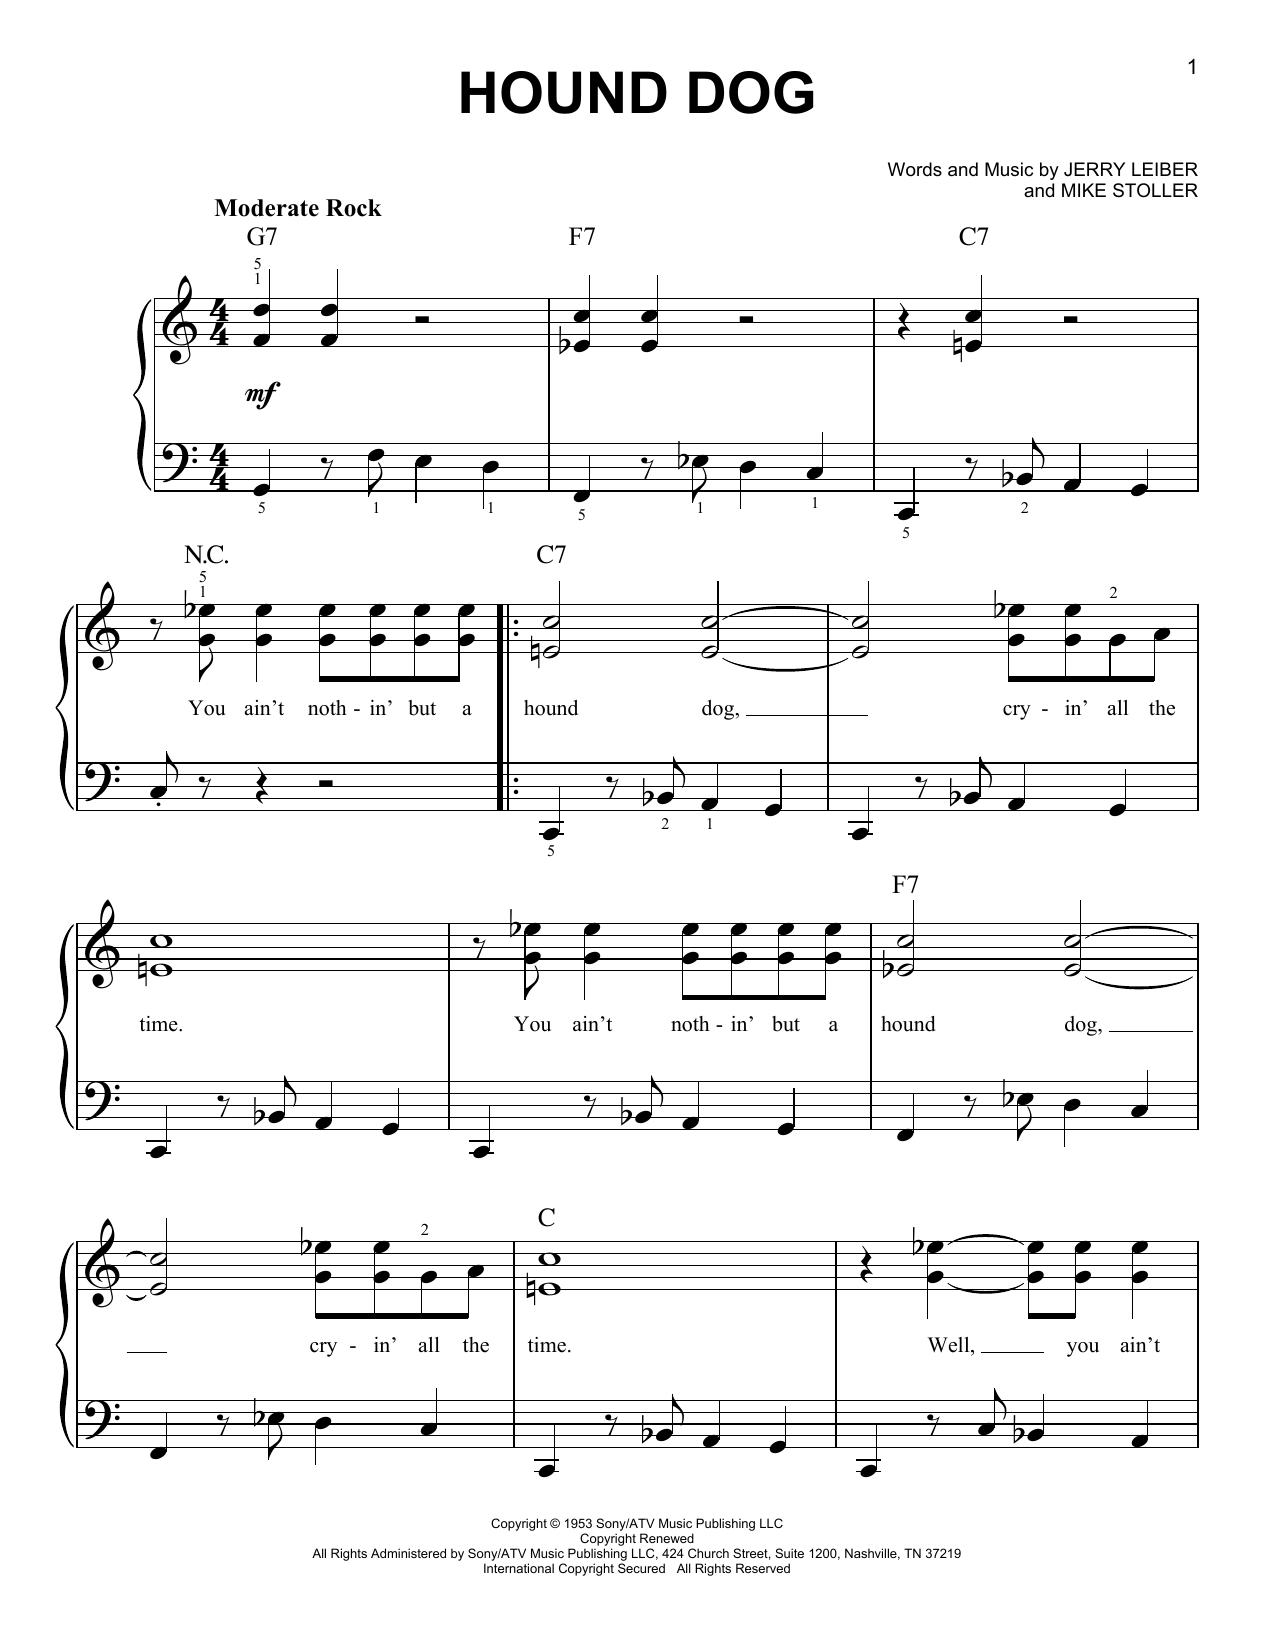 Elvis Presley Hound Dog sheet music notes and chords. Download Printable PDF.